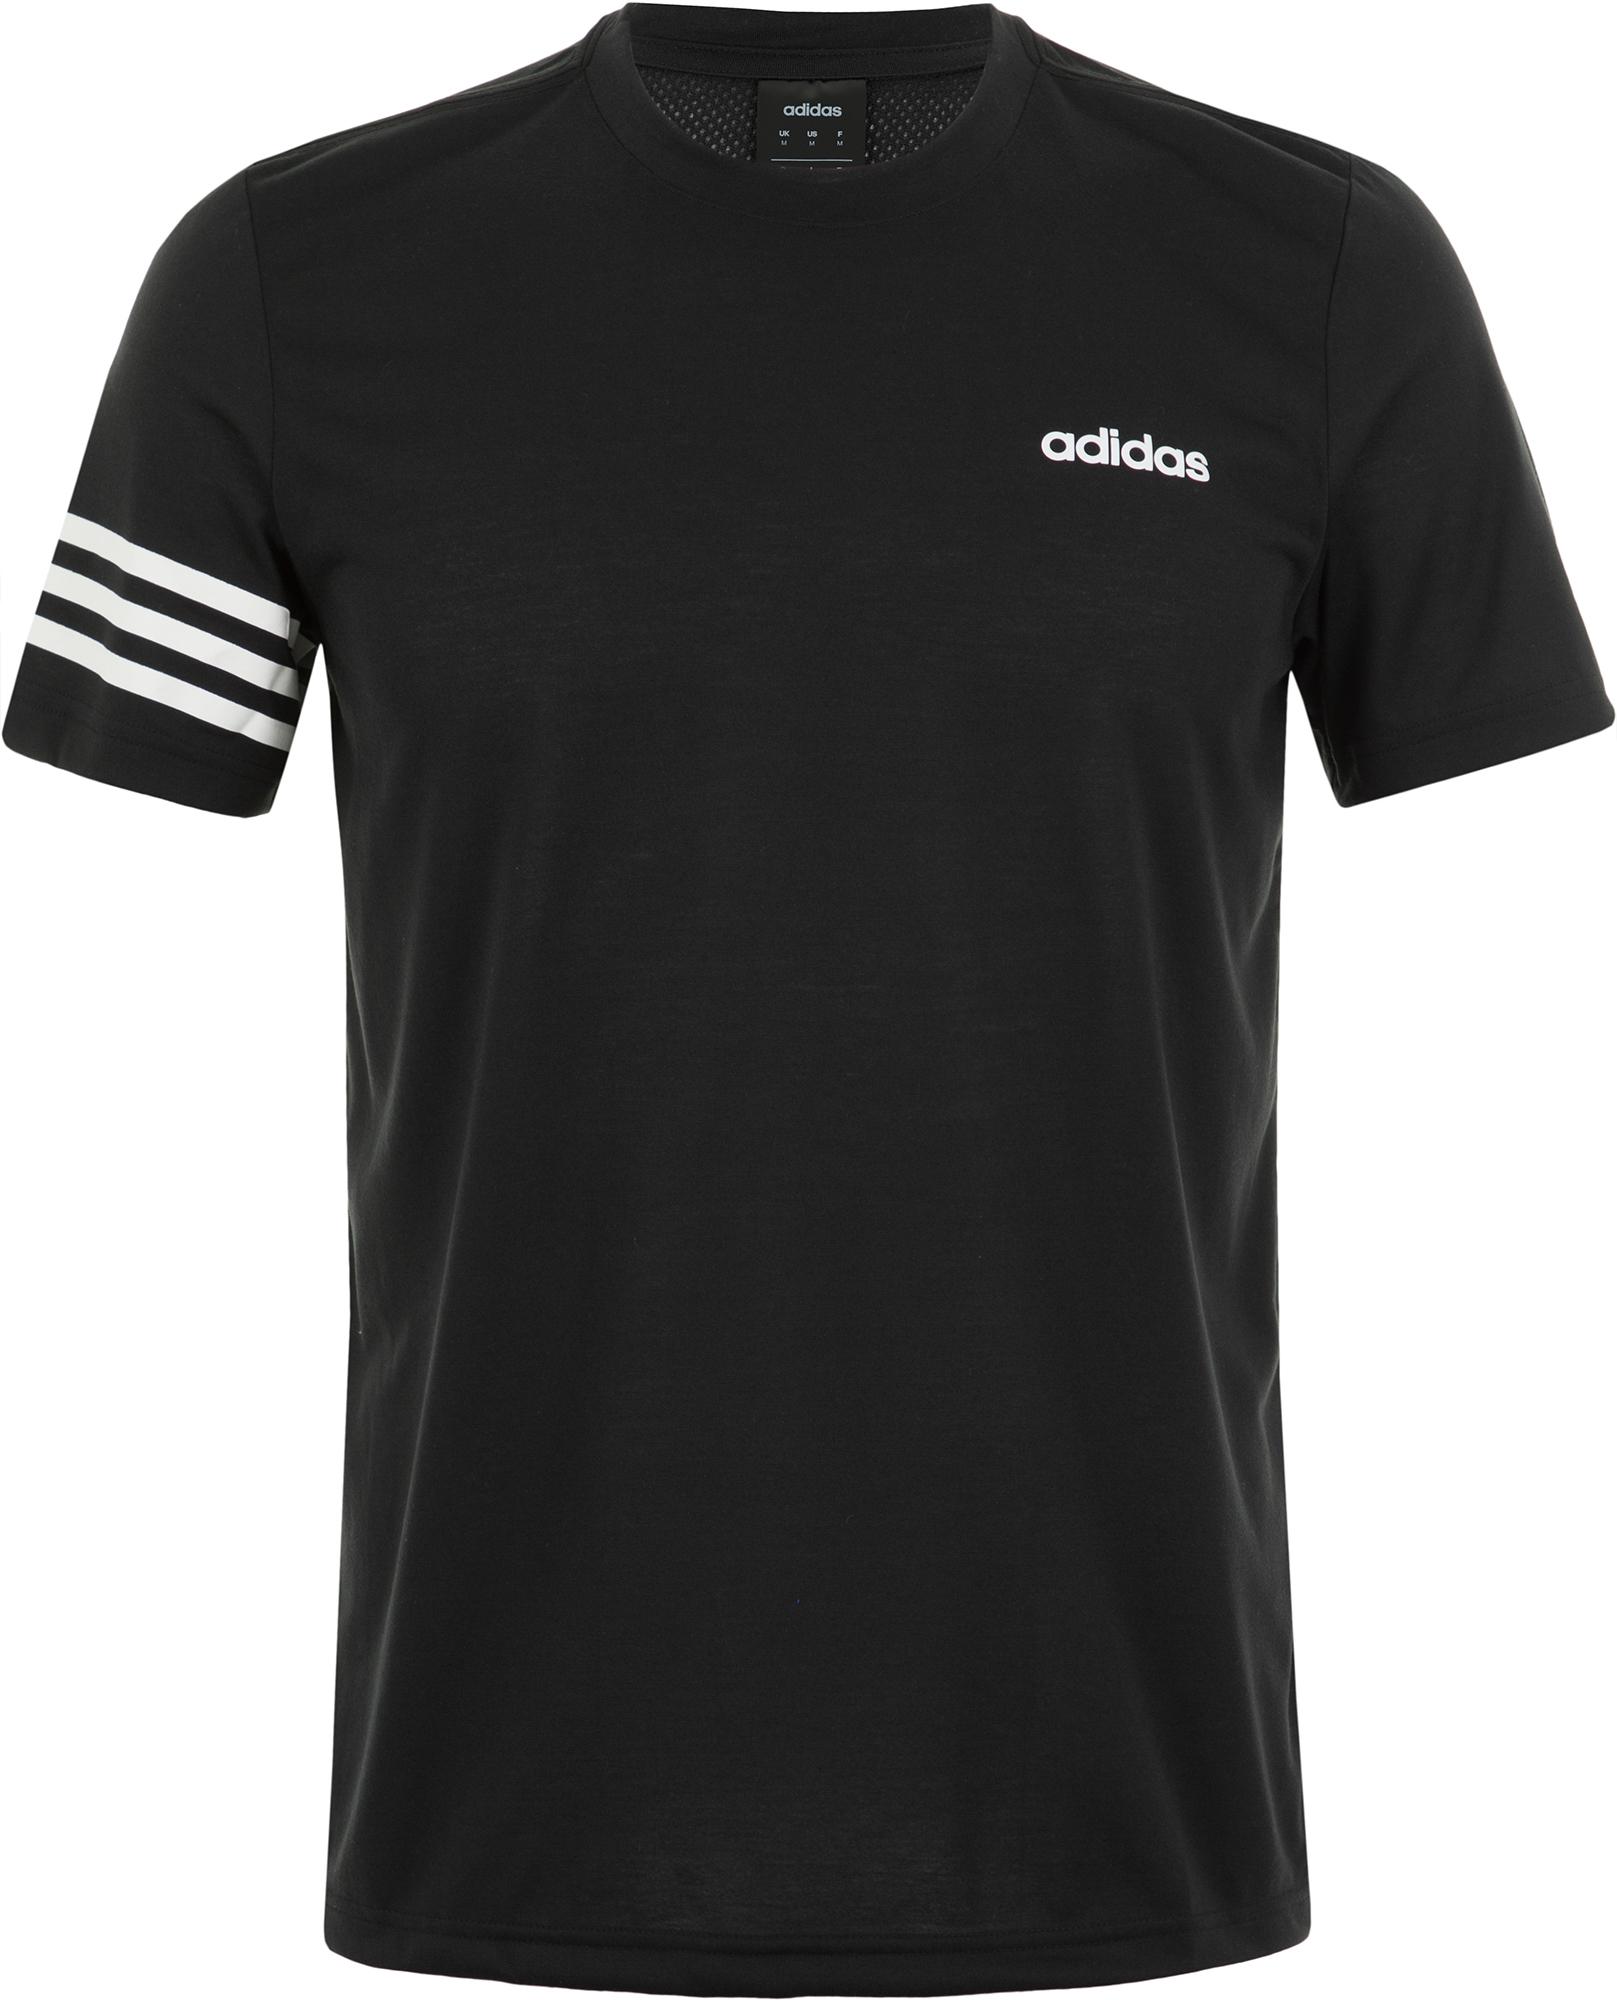 Adidas Футболка мужская Adidas, размер 56